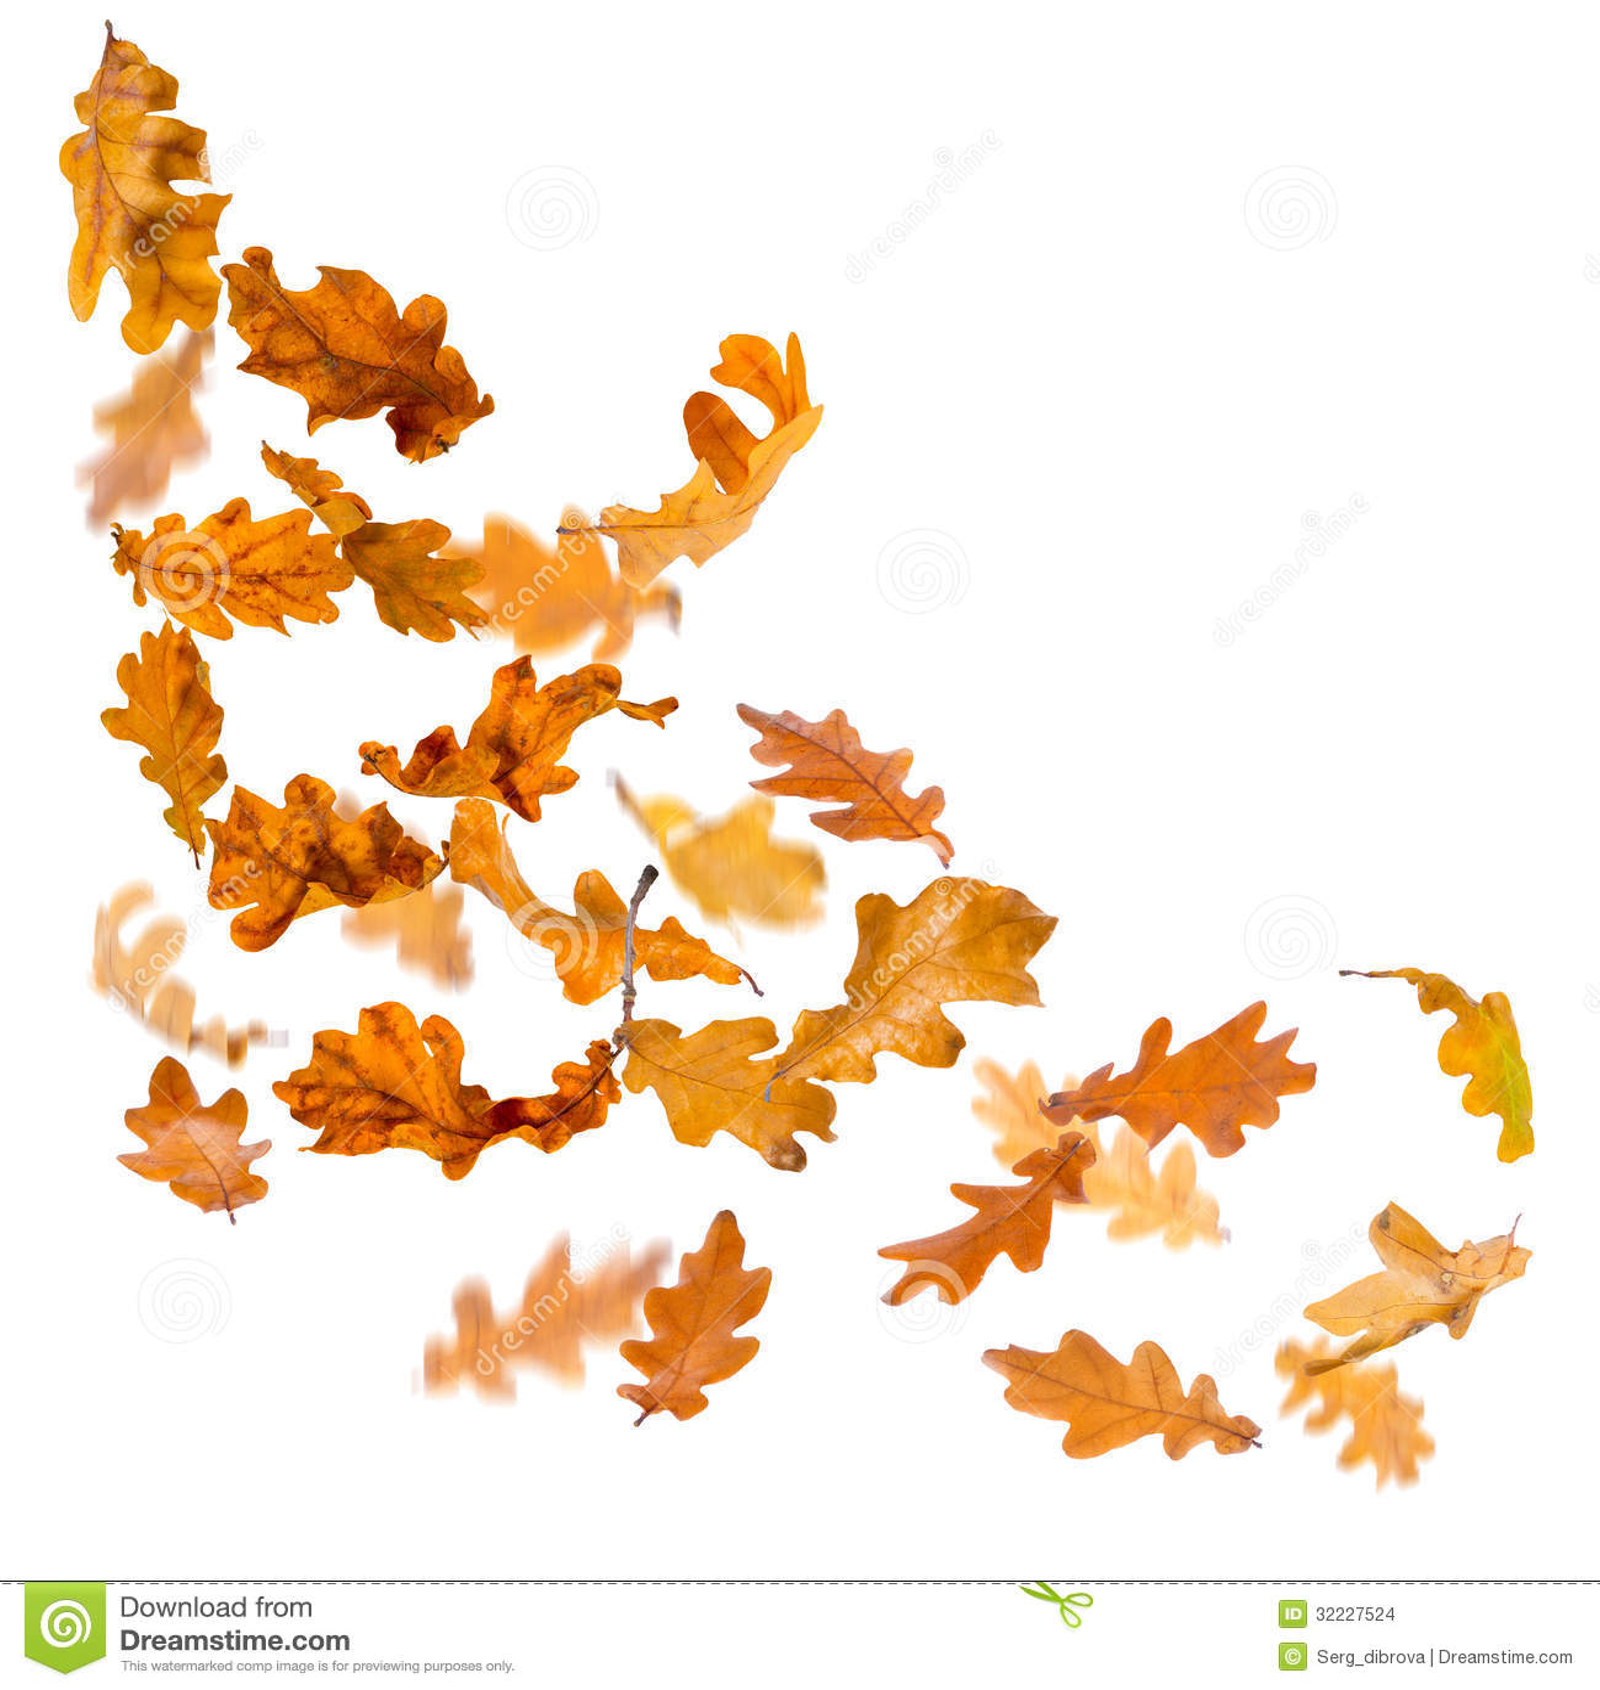 Wallpaper Border Falling Off Oak Leaves Falling Stock Images Image 32227524